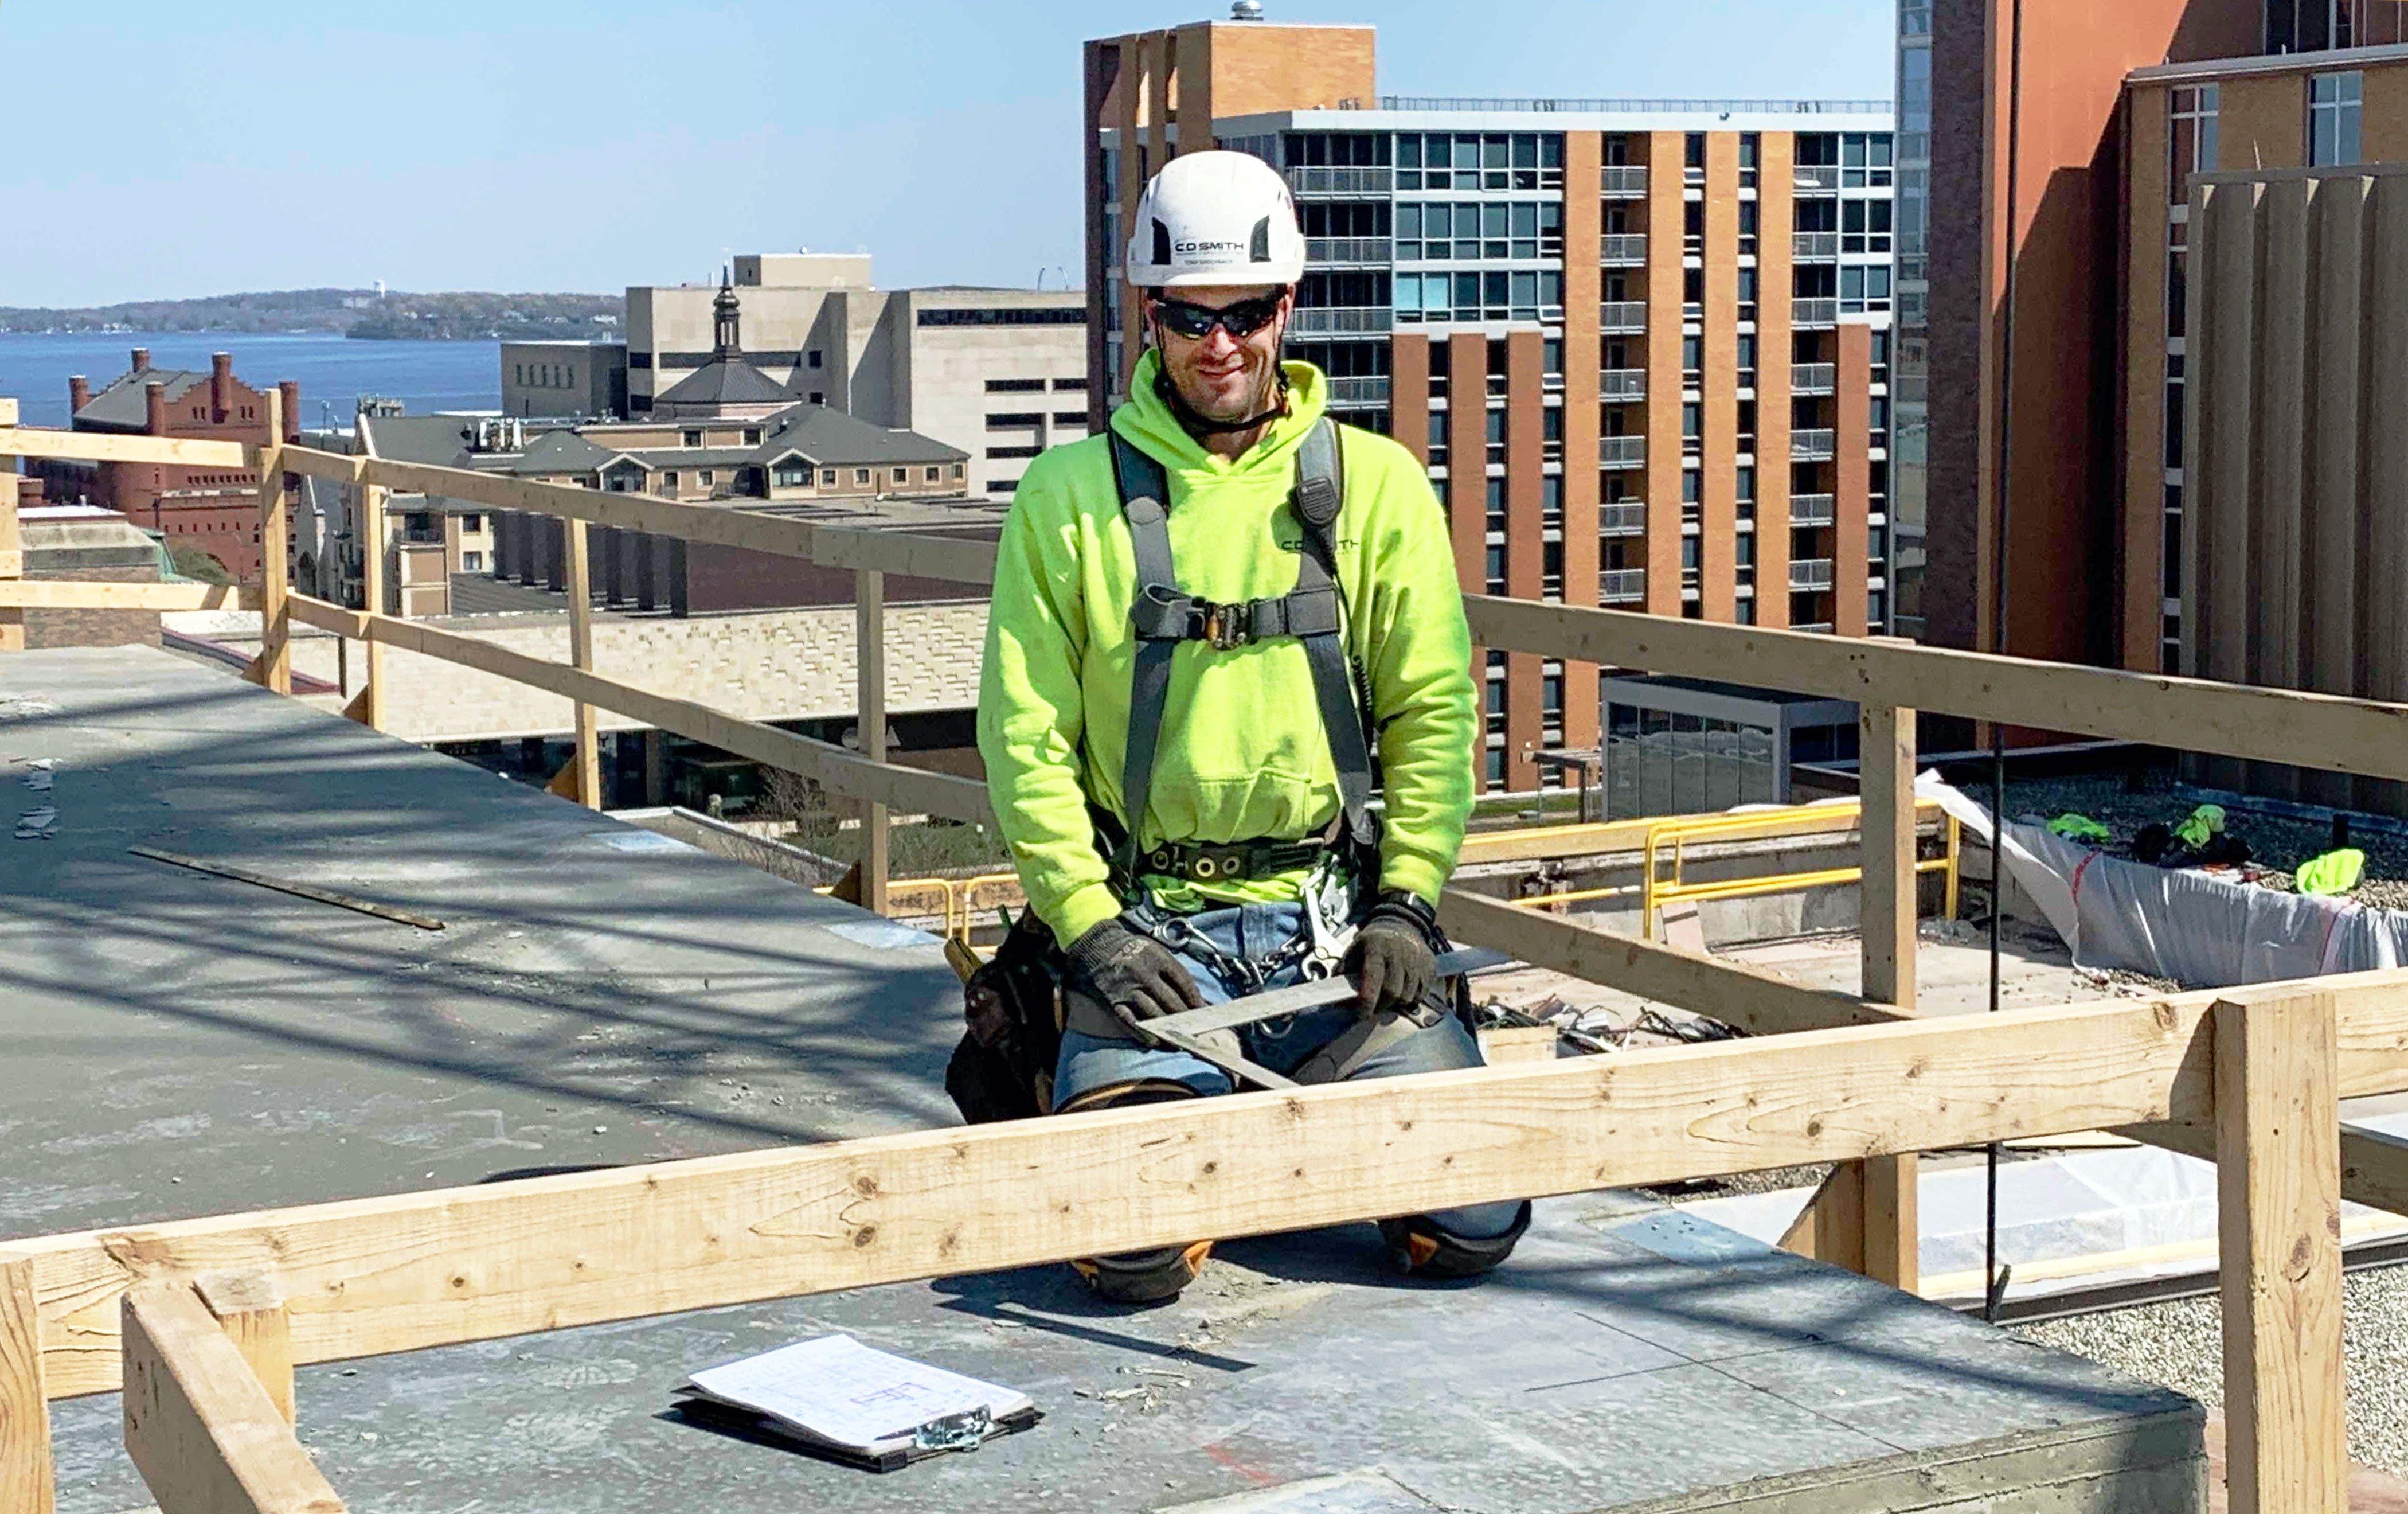 C.D. Smith Construction Carpenter Superintendent Tony Birschbach Commercial Construction Trades Field Team Renovation Project